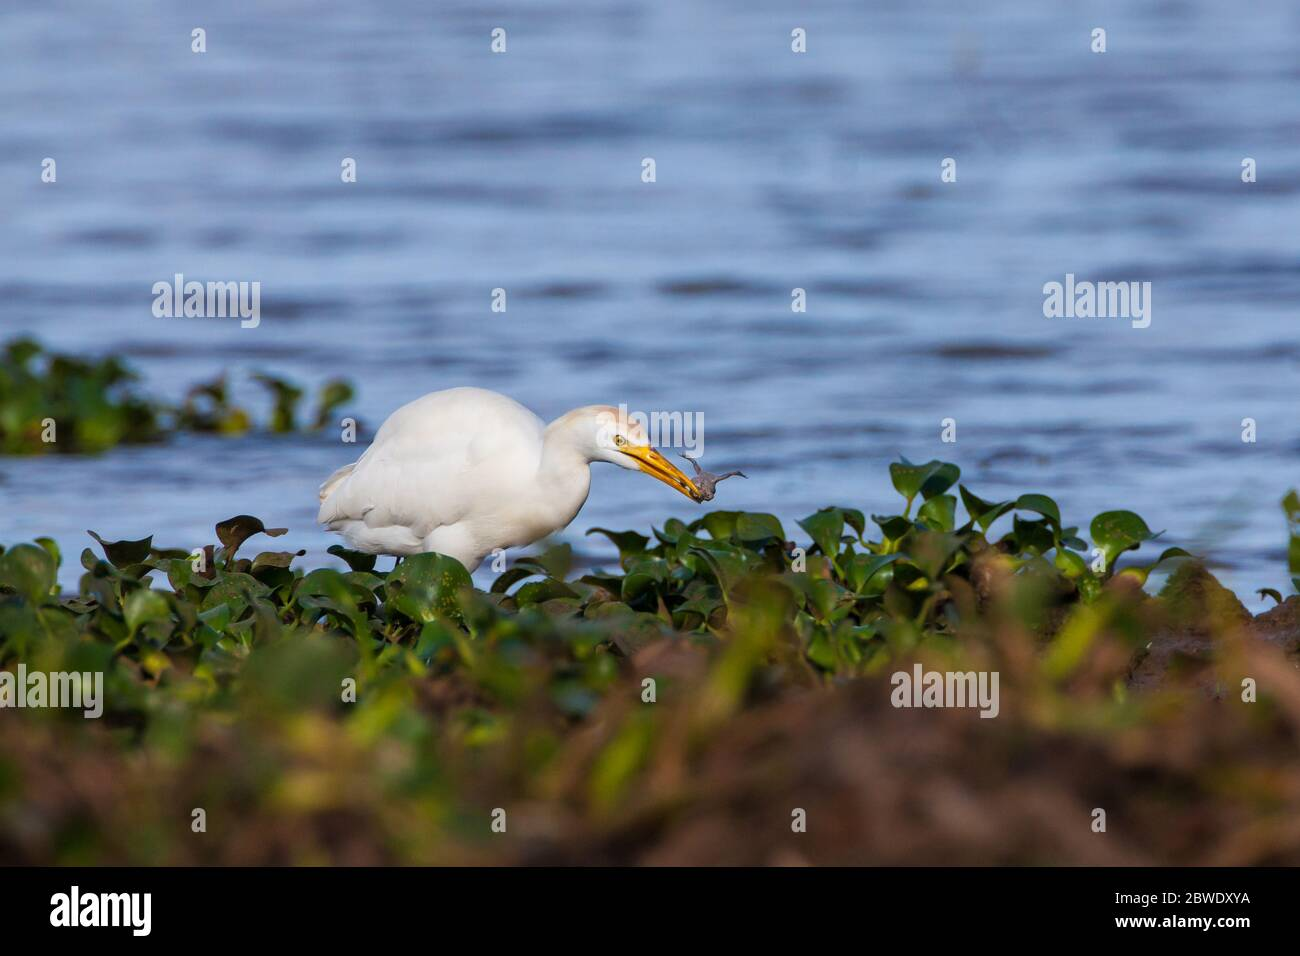 Cattle Egret, Bubulcus ibis, with a frog at the lakeside of Refugio de la vida silvestre Cienaga de las Macanas, Herrera province, Republic of Panama. Stock Photo